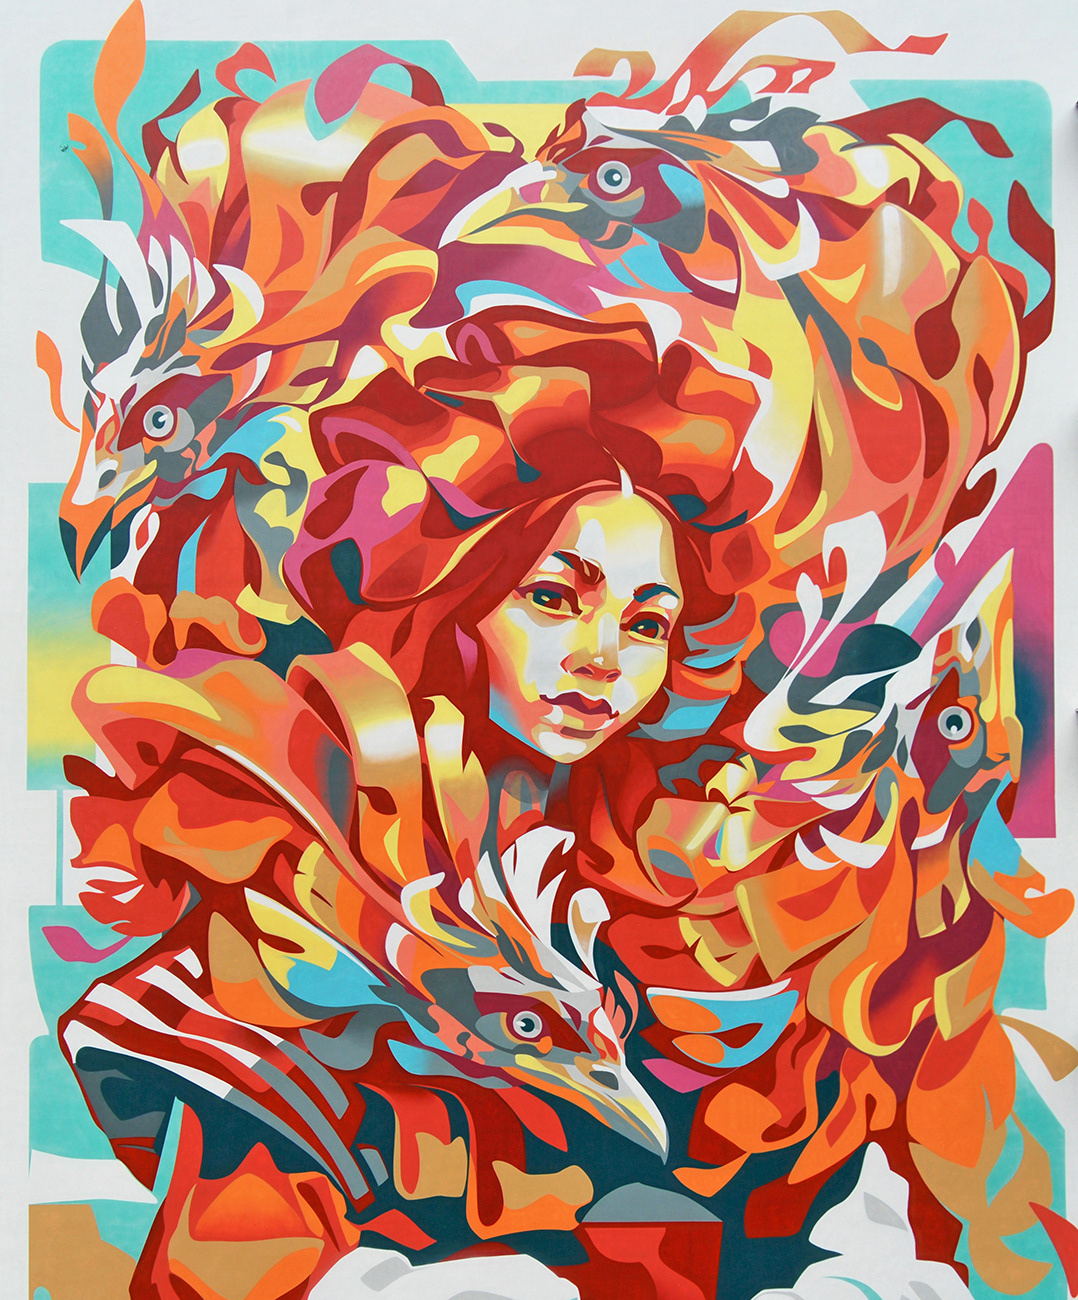 Art Direction, Illustration, Street Art